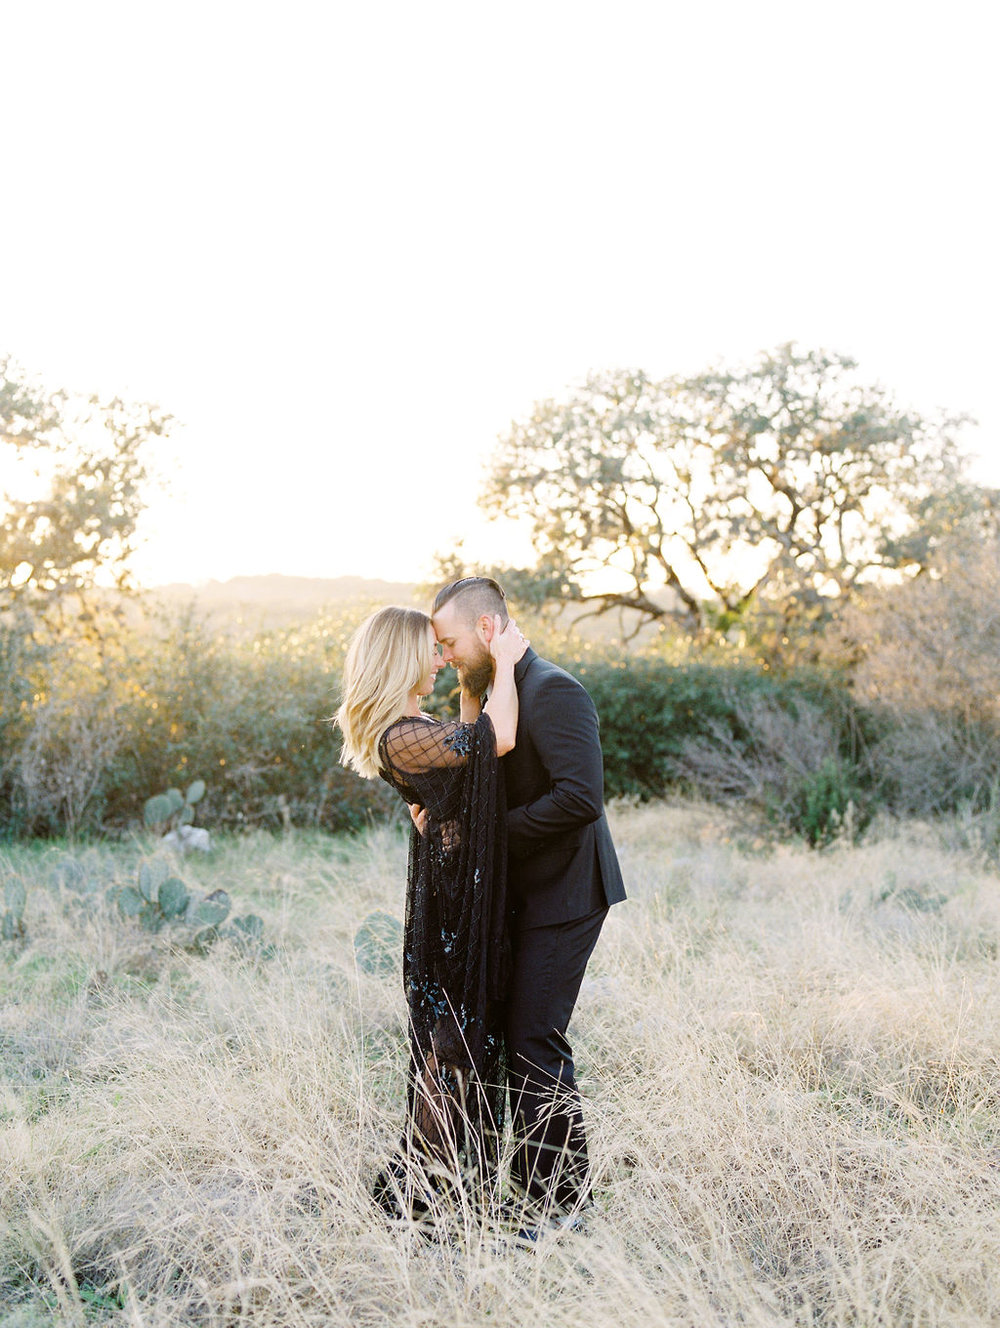 Austin-Film-Wedding-Engagement-Photographer-Reimers-Ranch-34.jpg